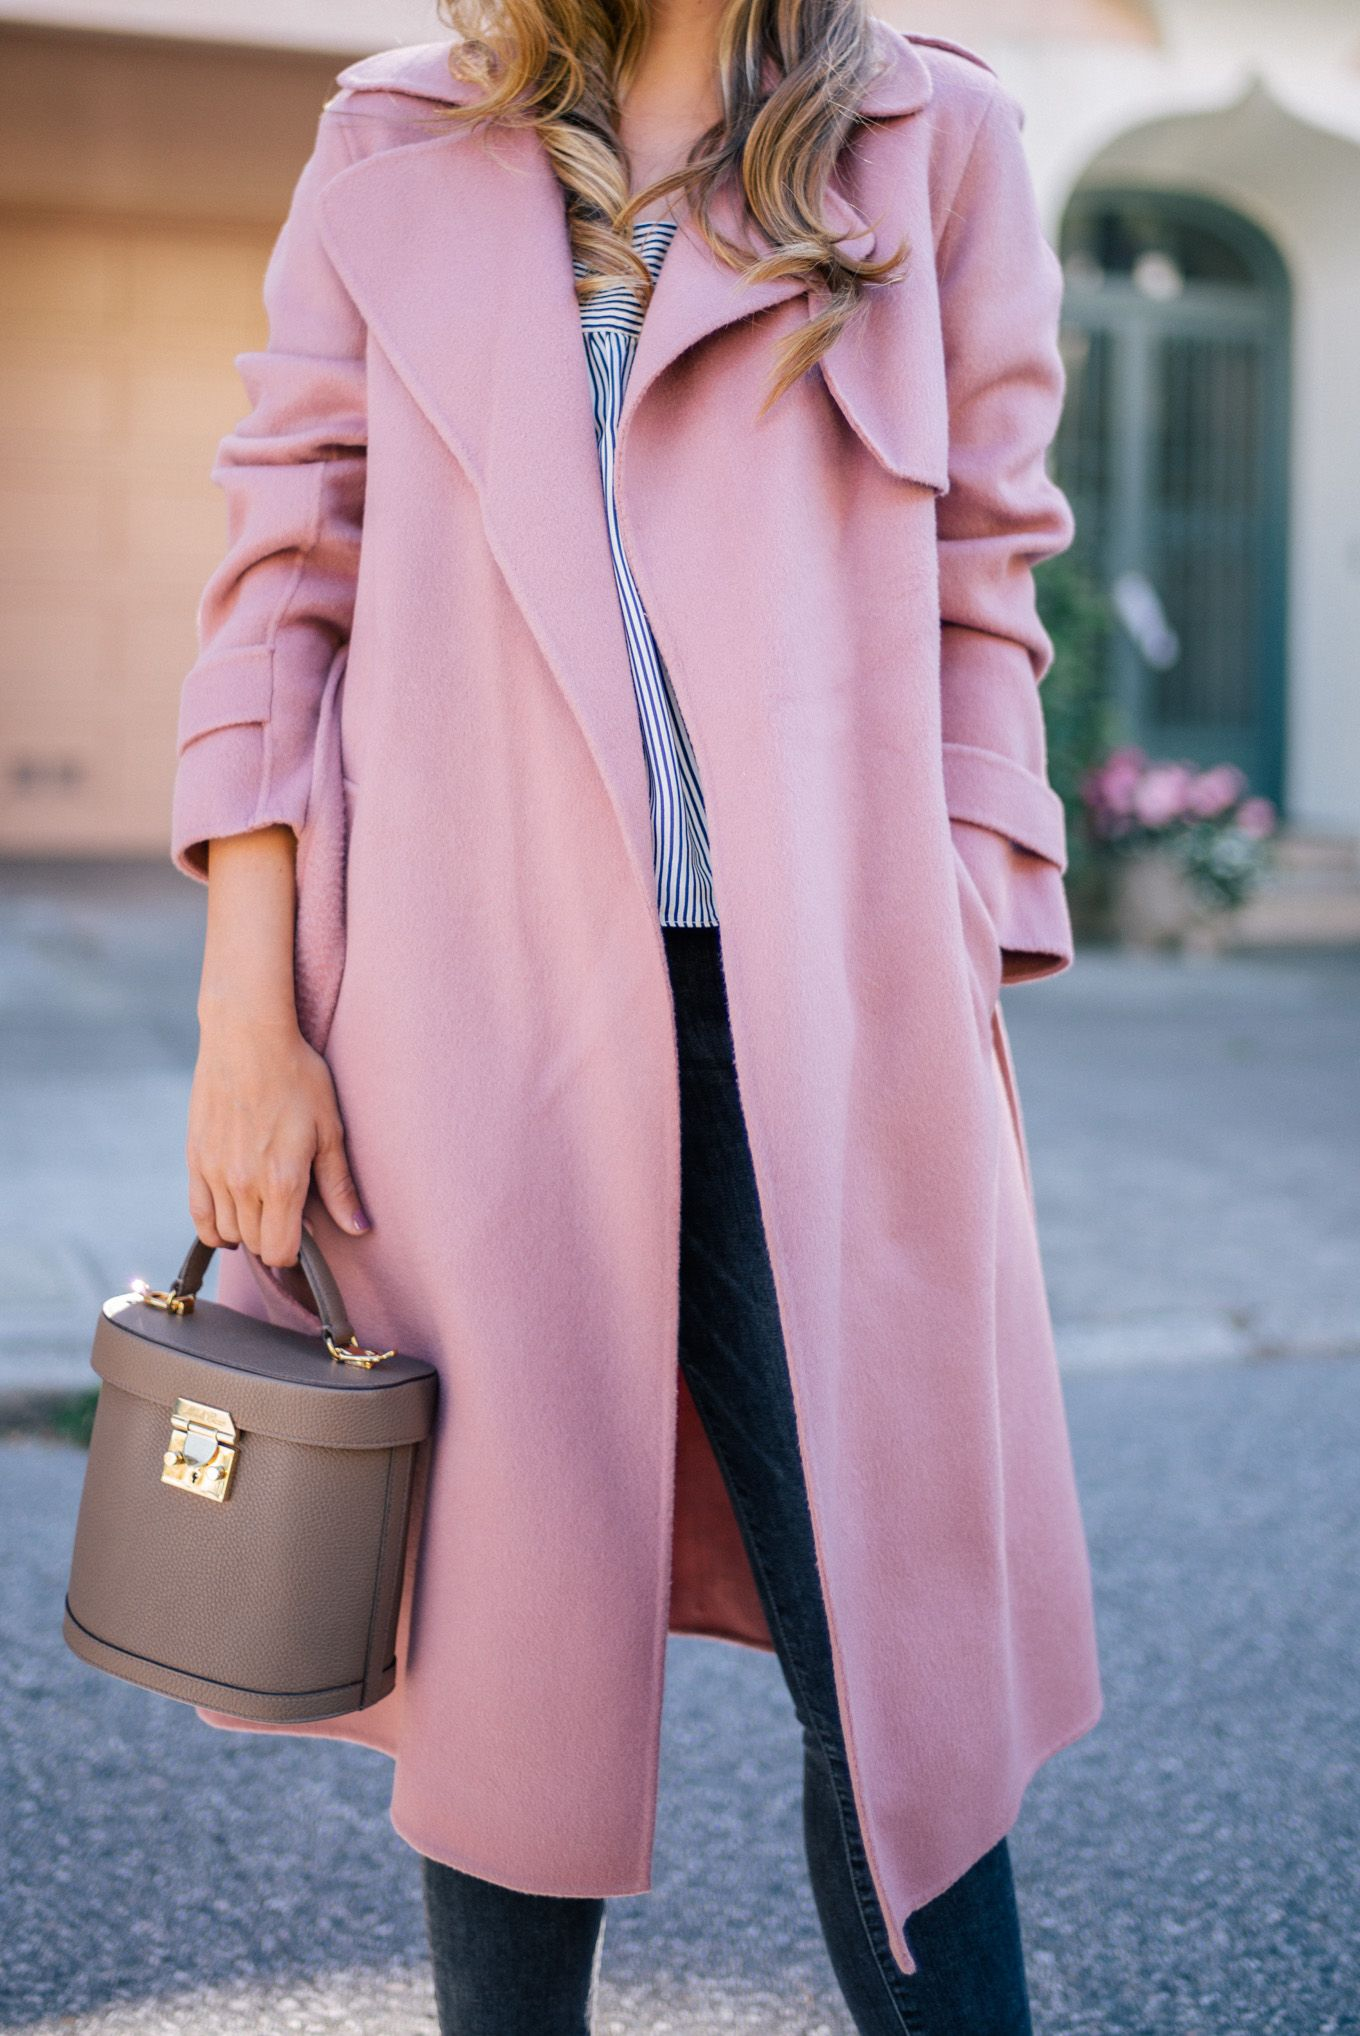 308e08780e Gal Meets Glam Dusty Rose Coat - Theory coat